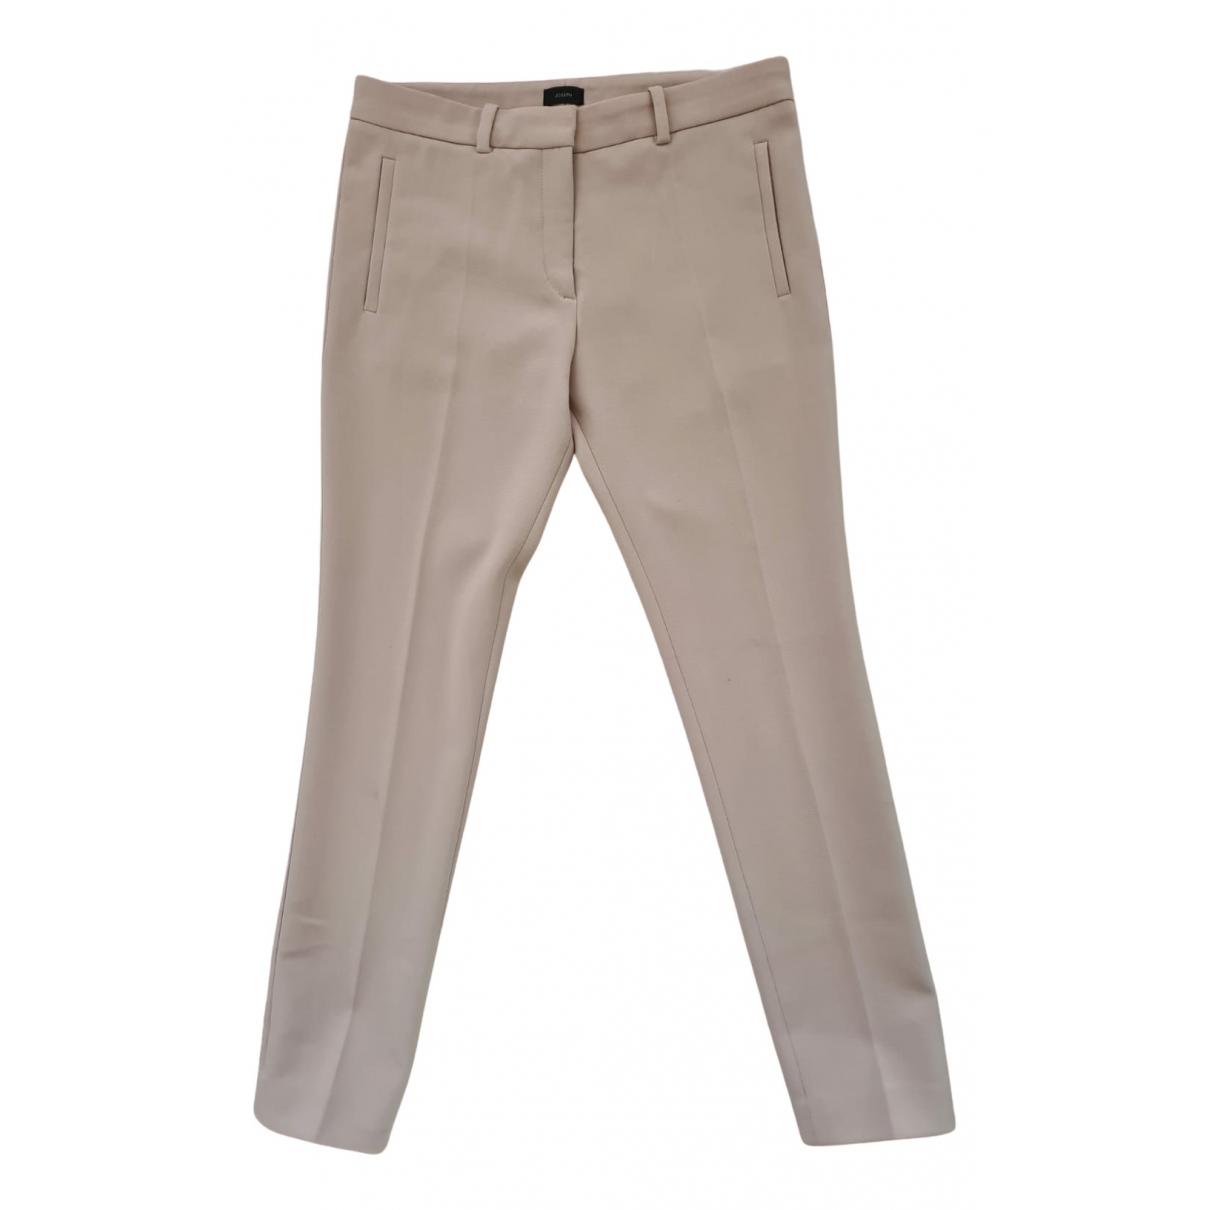 Pantalon en Poliester Beige Joseph